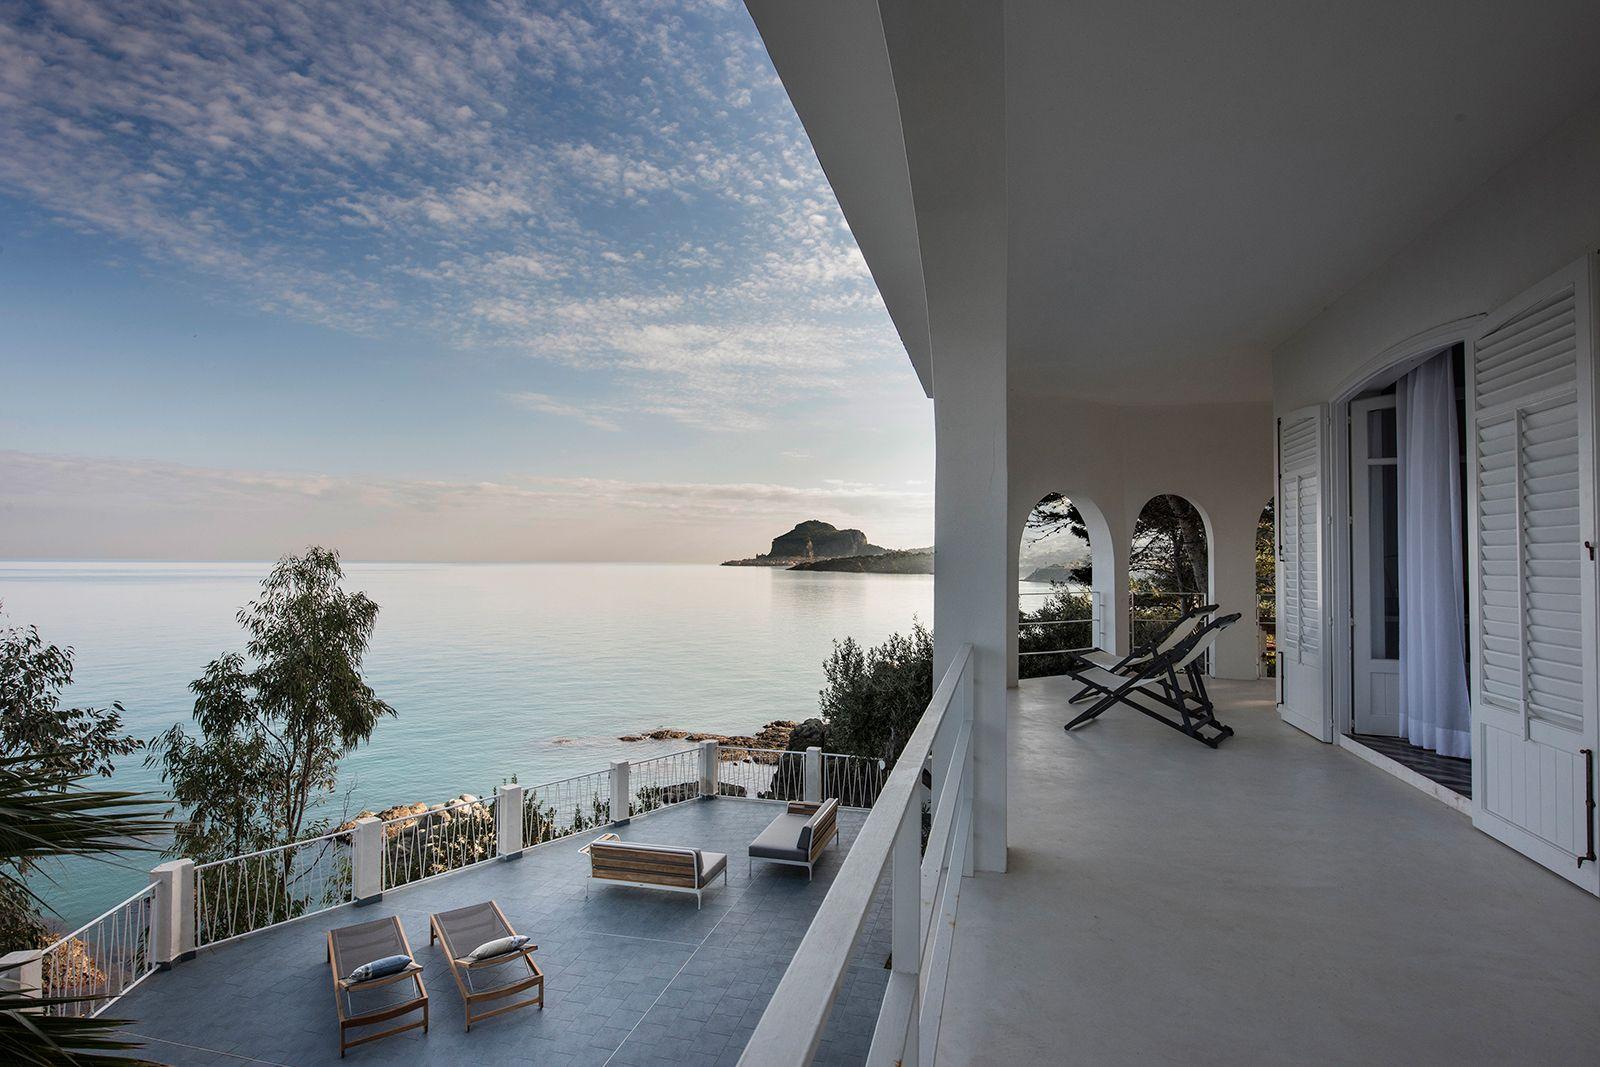 Simple Luxury Villas For Rent Villas To Rent Cefalu Cliff Villa Holiday Home Island Villa Villa Rental